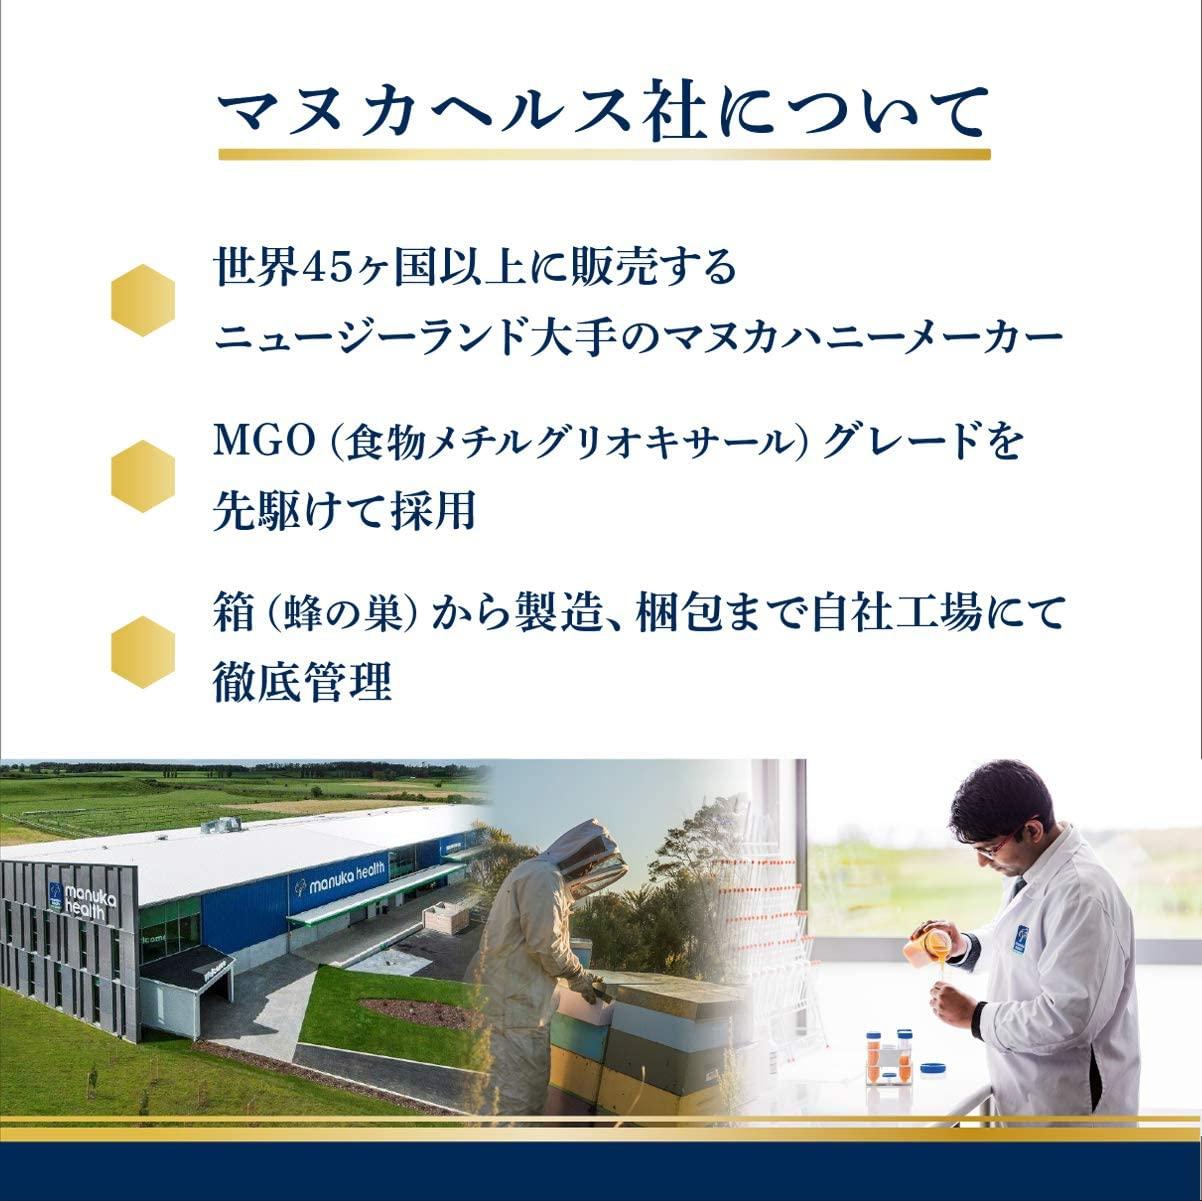 Manuka Health(マヌカへルス) MGO 400+ Manuka Honeyの商品画像10